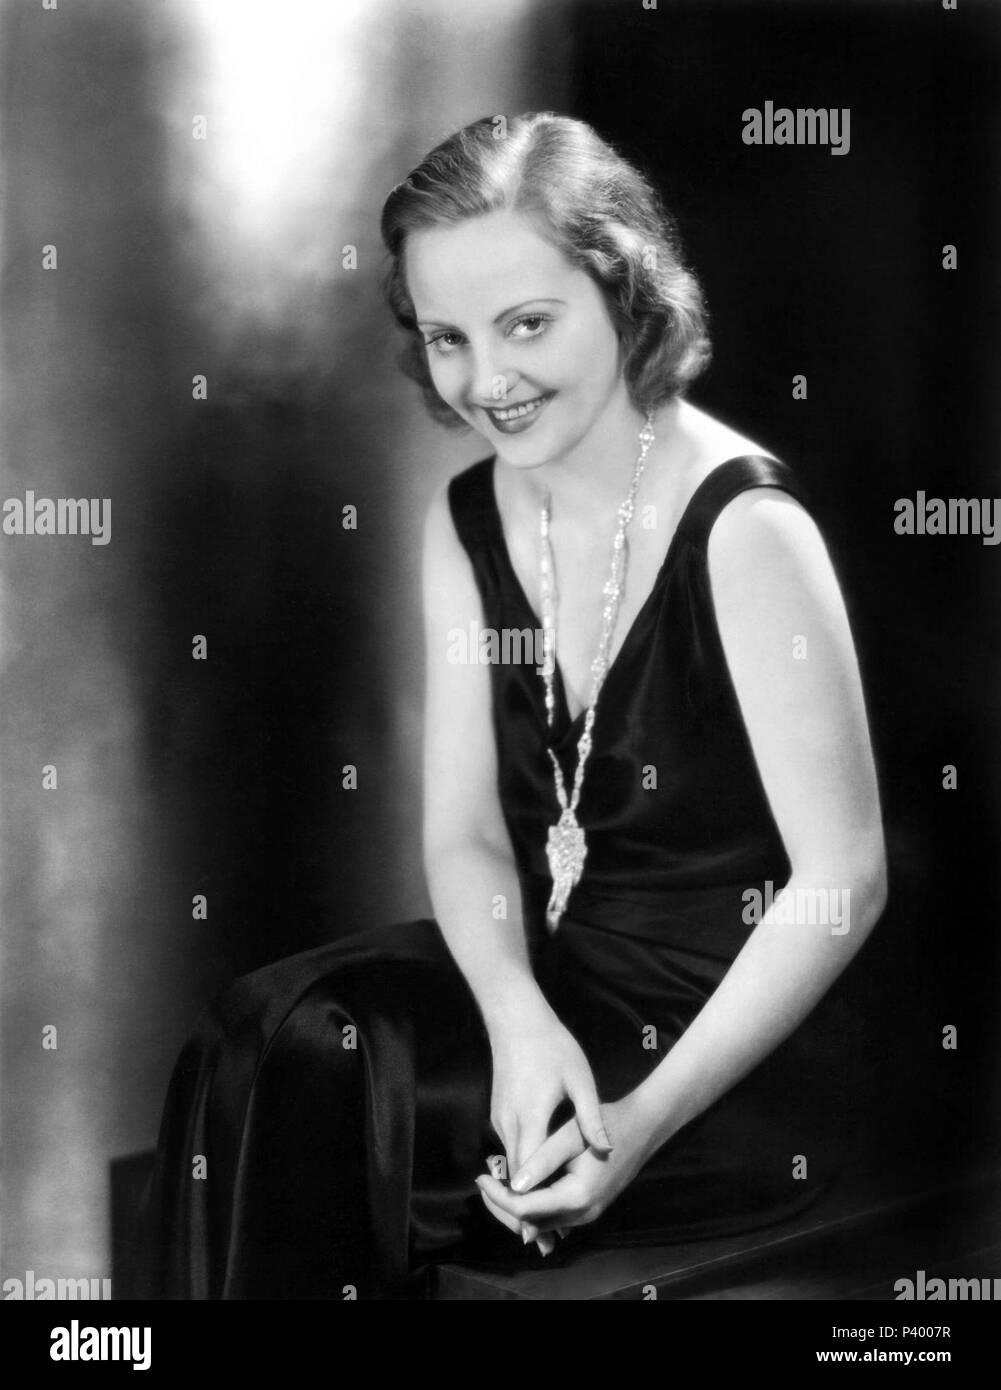 Joan Collins (born 1933) images